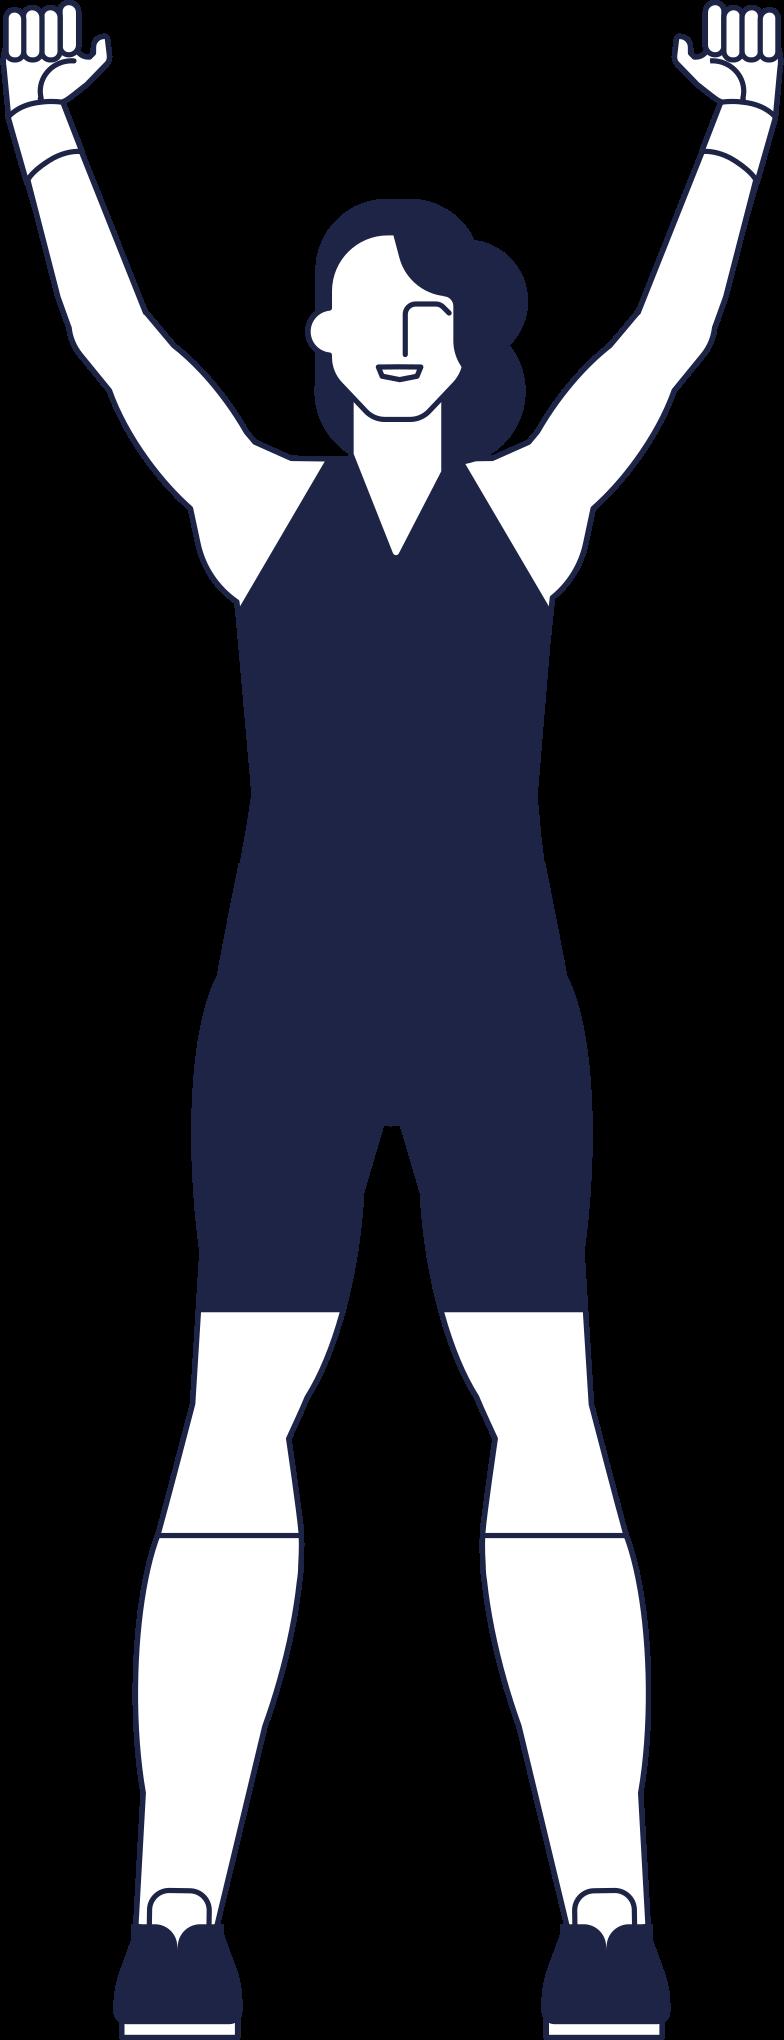 Linha de mulher atleta concluída Clipart illustration in PNG, SVG